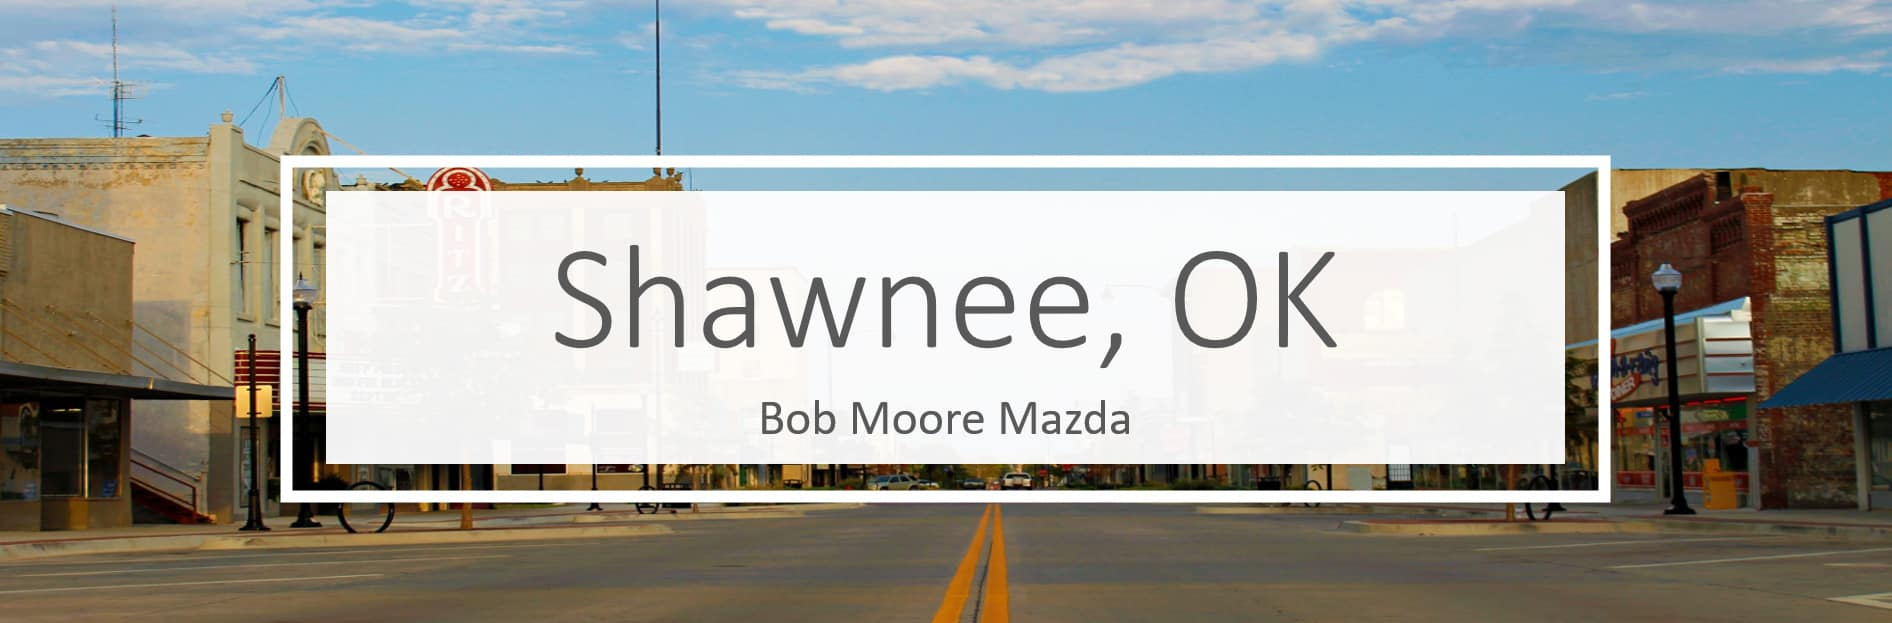 Mazda dealer om Shawnee